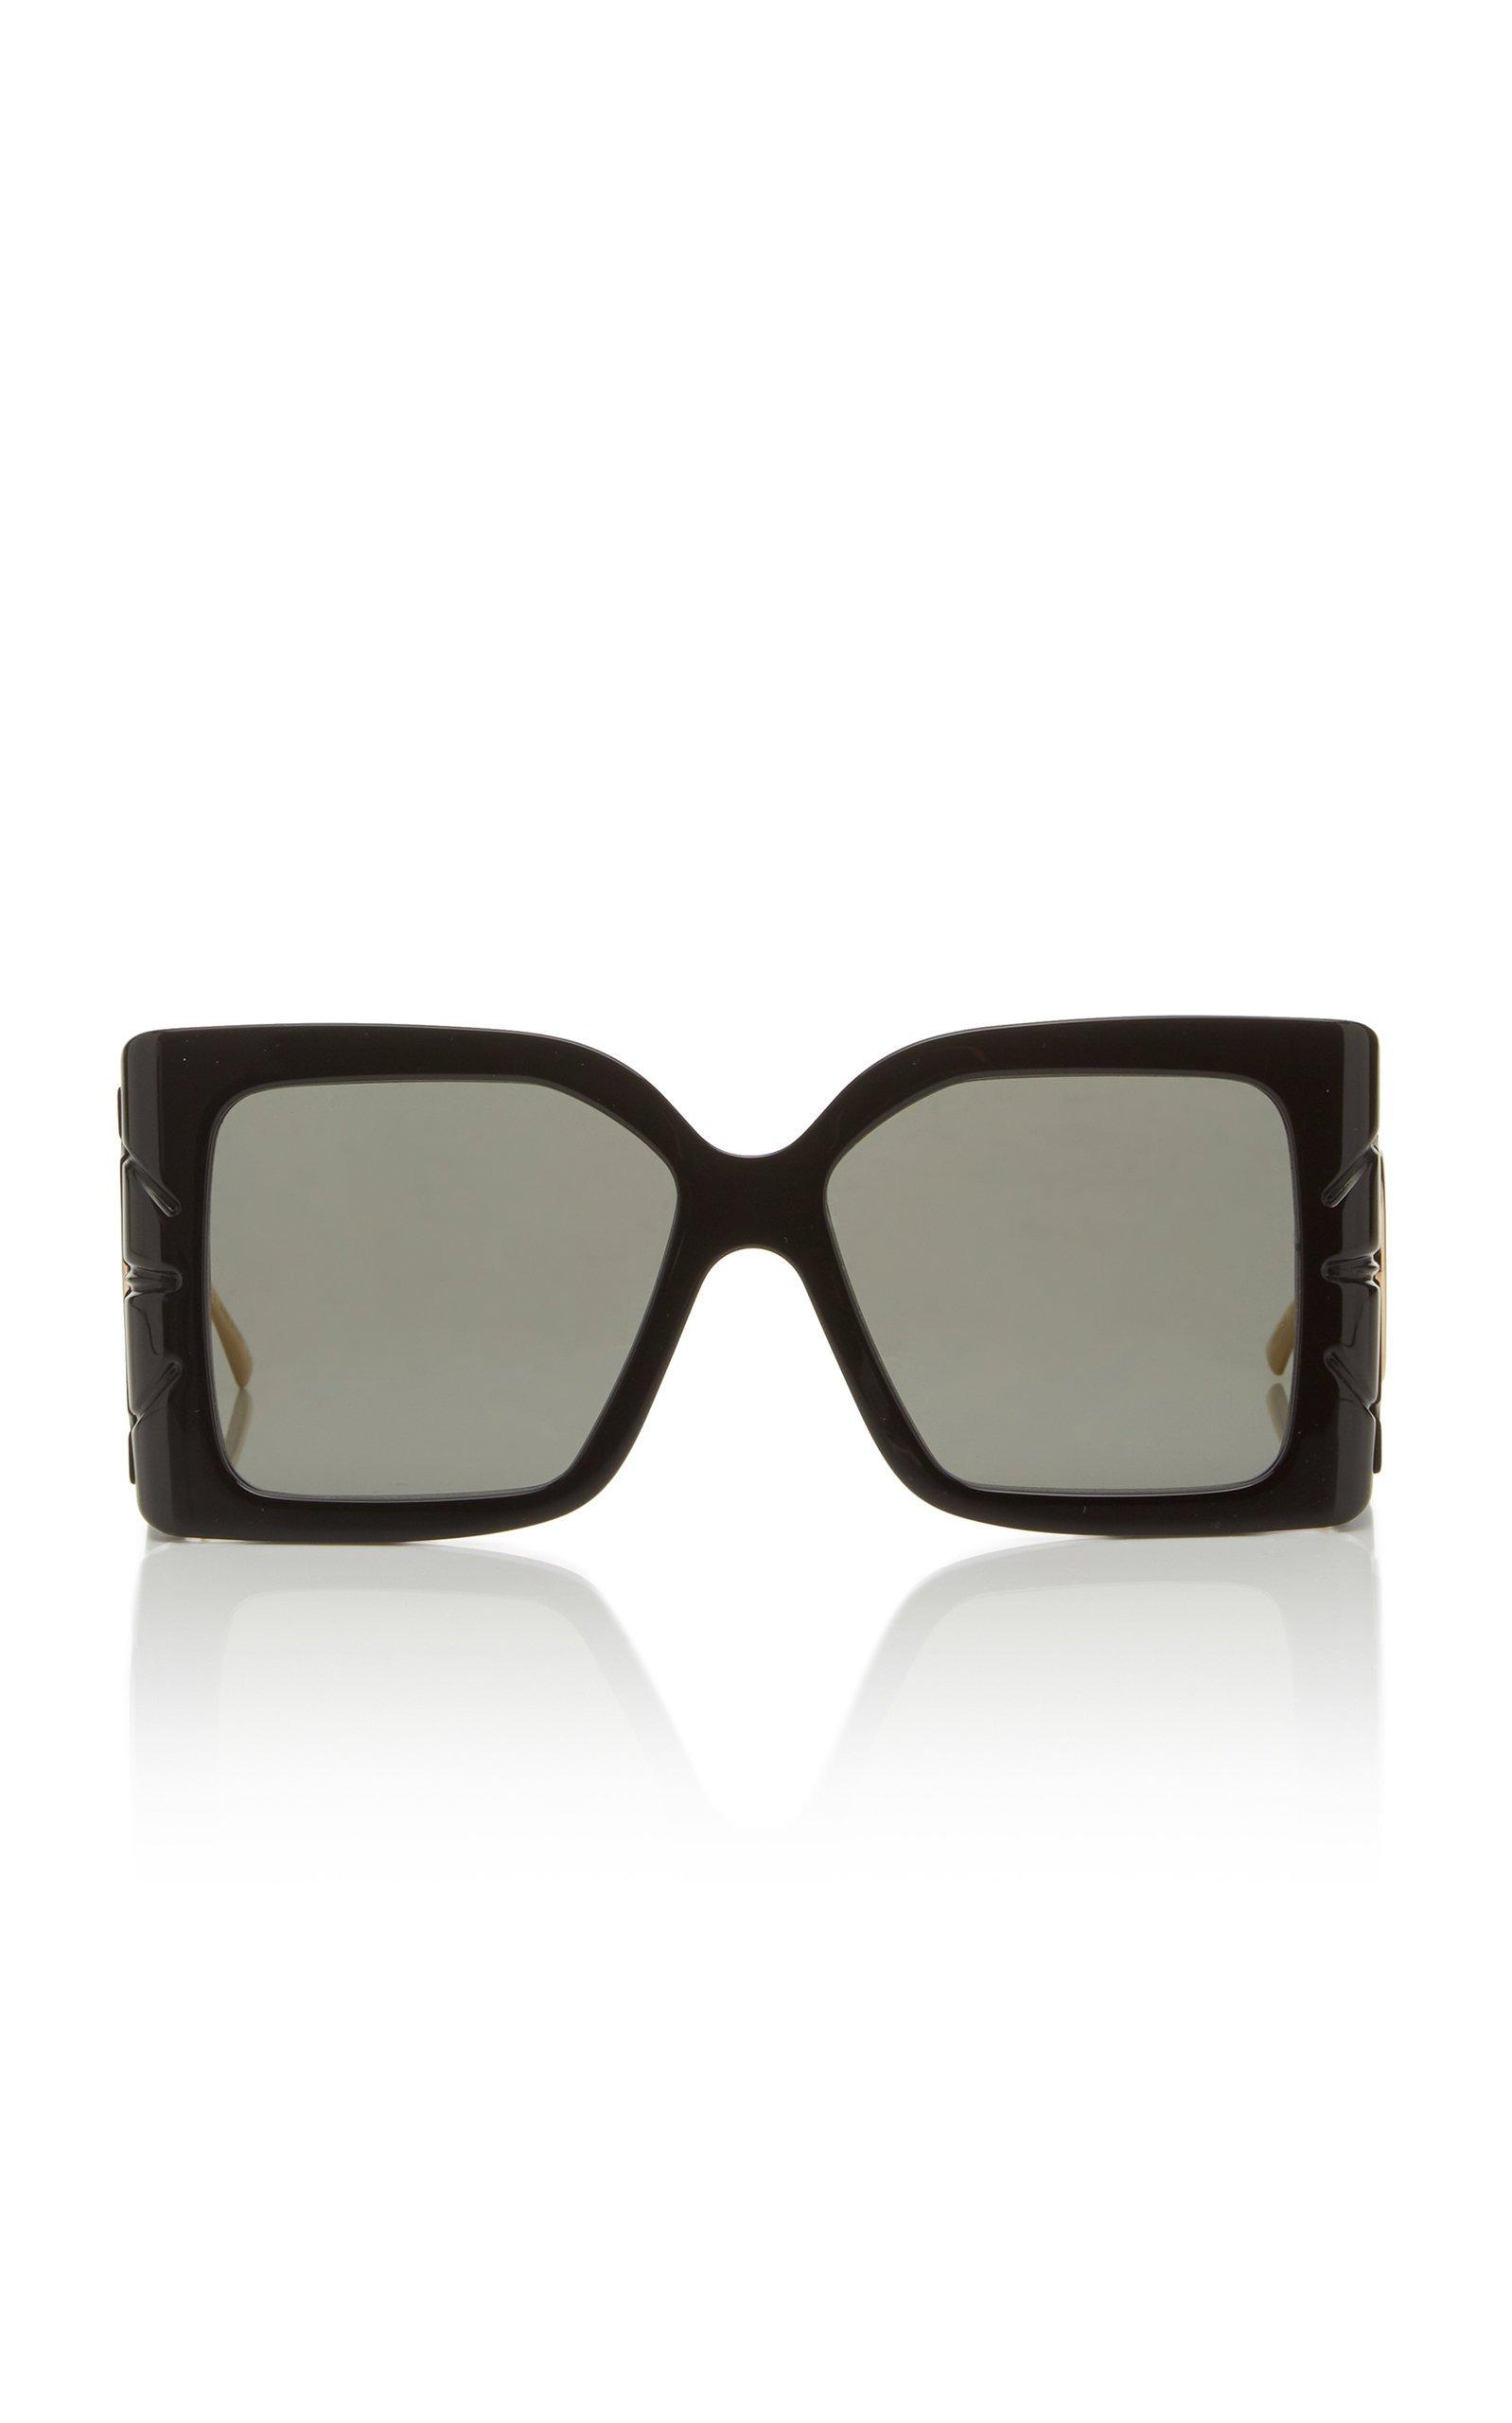 Gucci Acetate Oversized Square-Frame Sunglasses